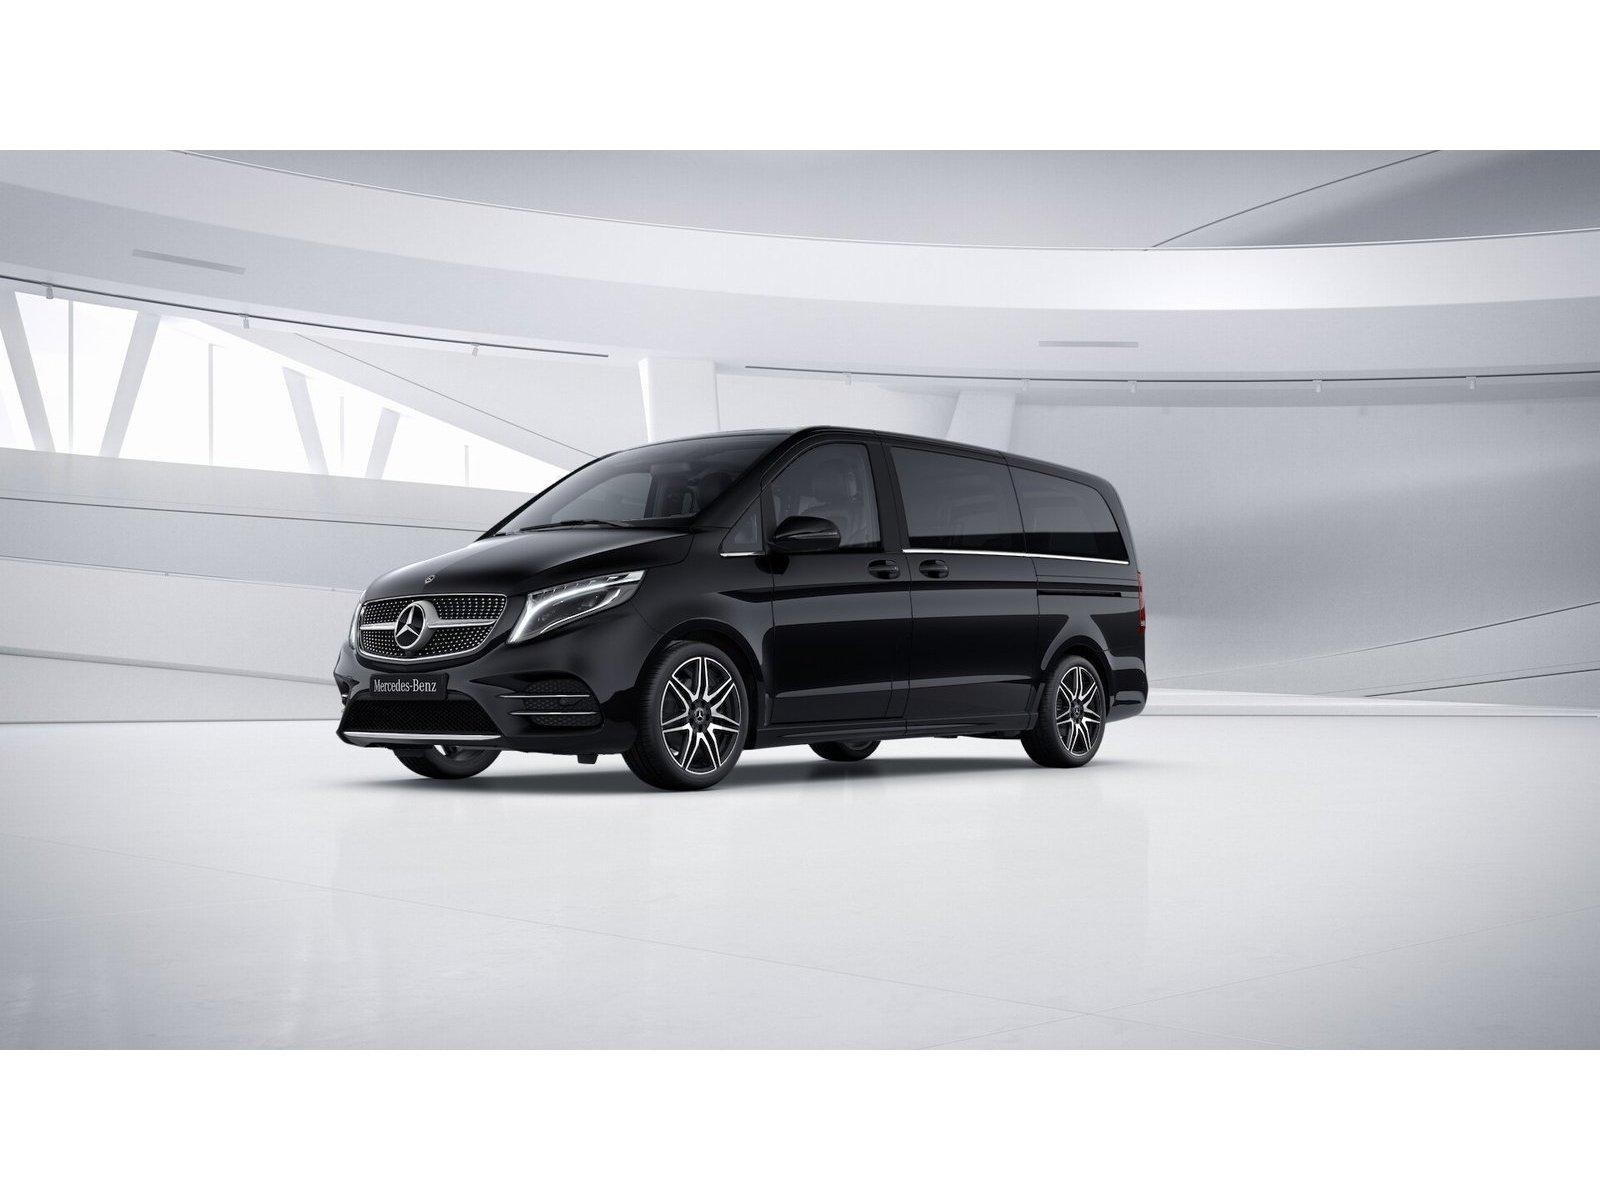 Mercedes-Benz V 250 d 4M AV. ED. Lang/Burm./AHK/Comand/Stdhz, Jahr 2017, Diesel